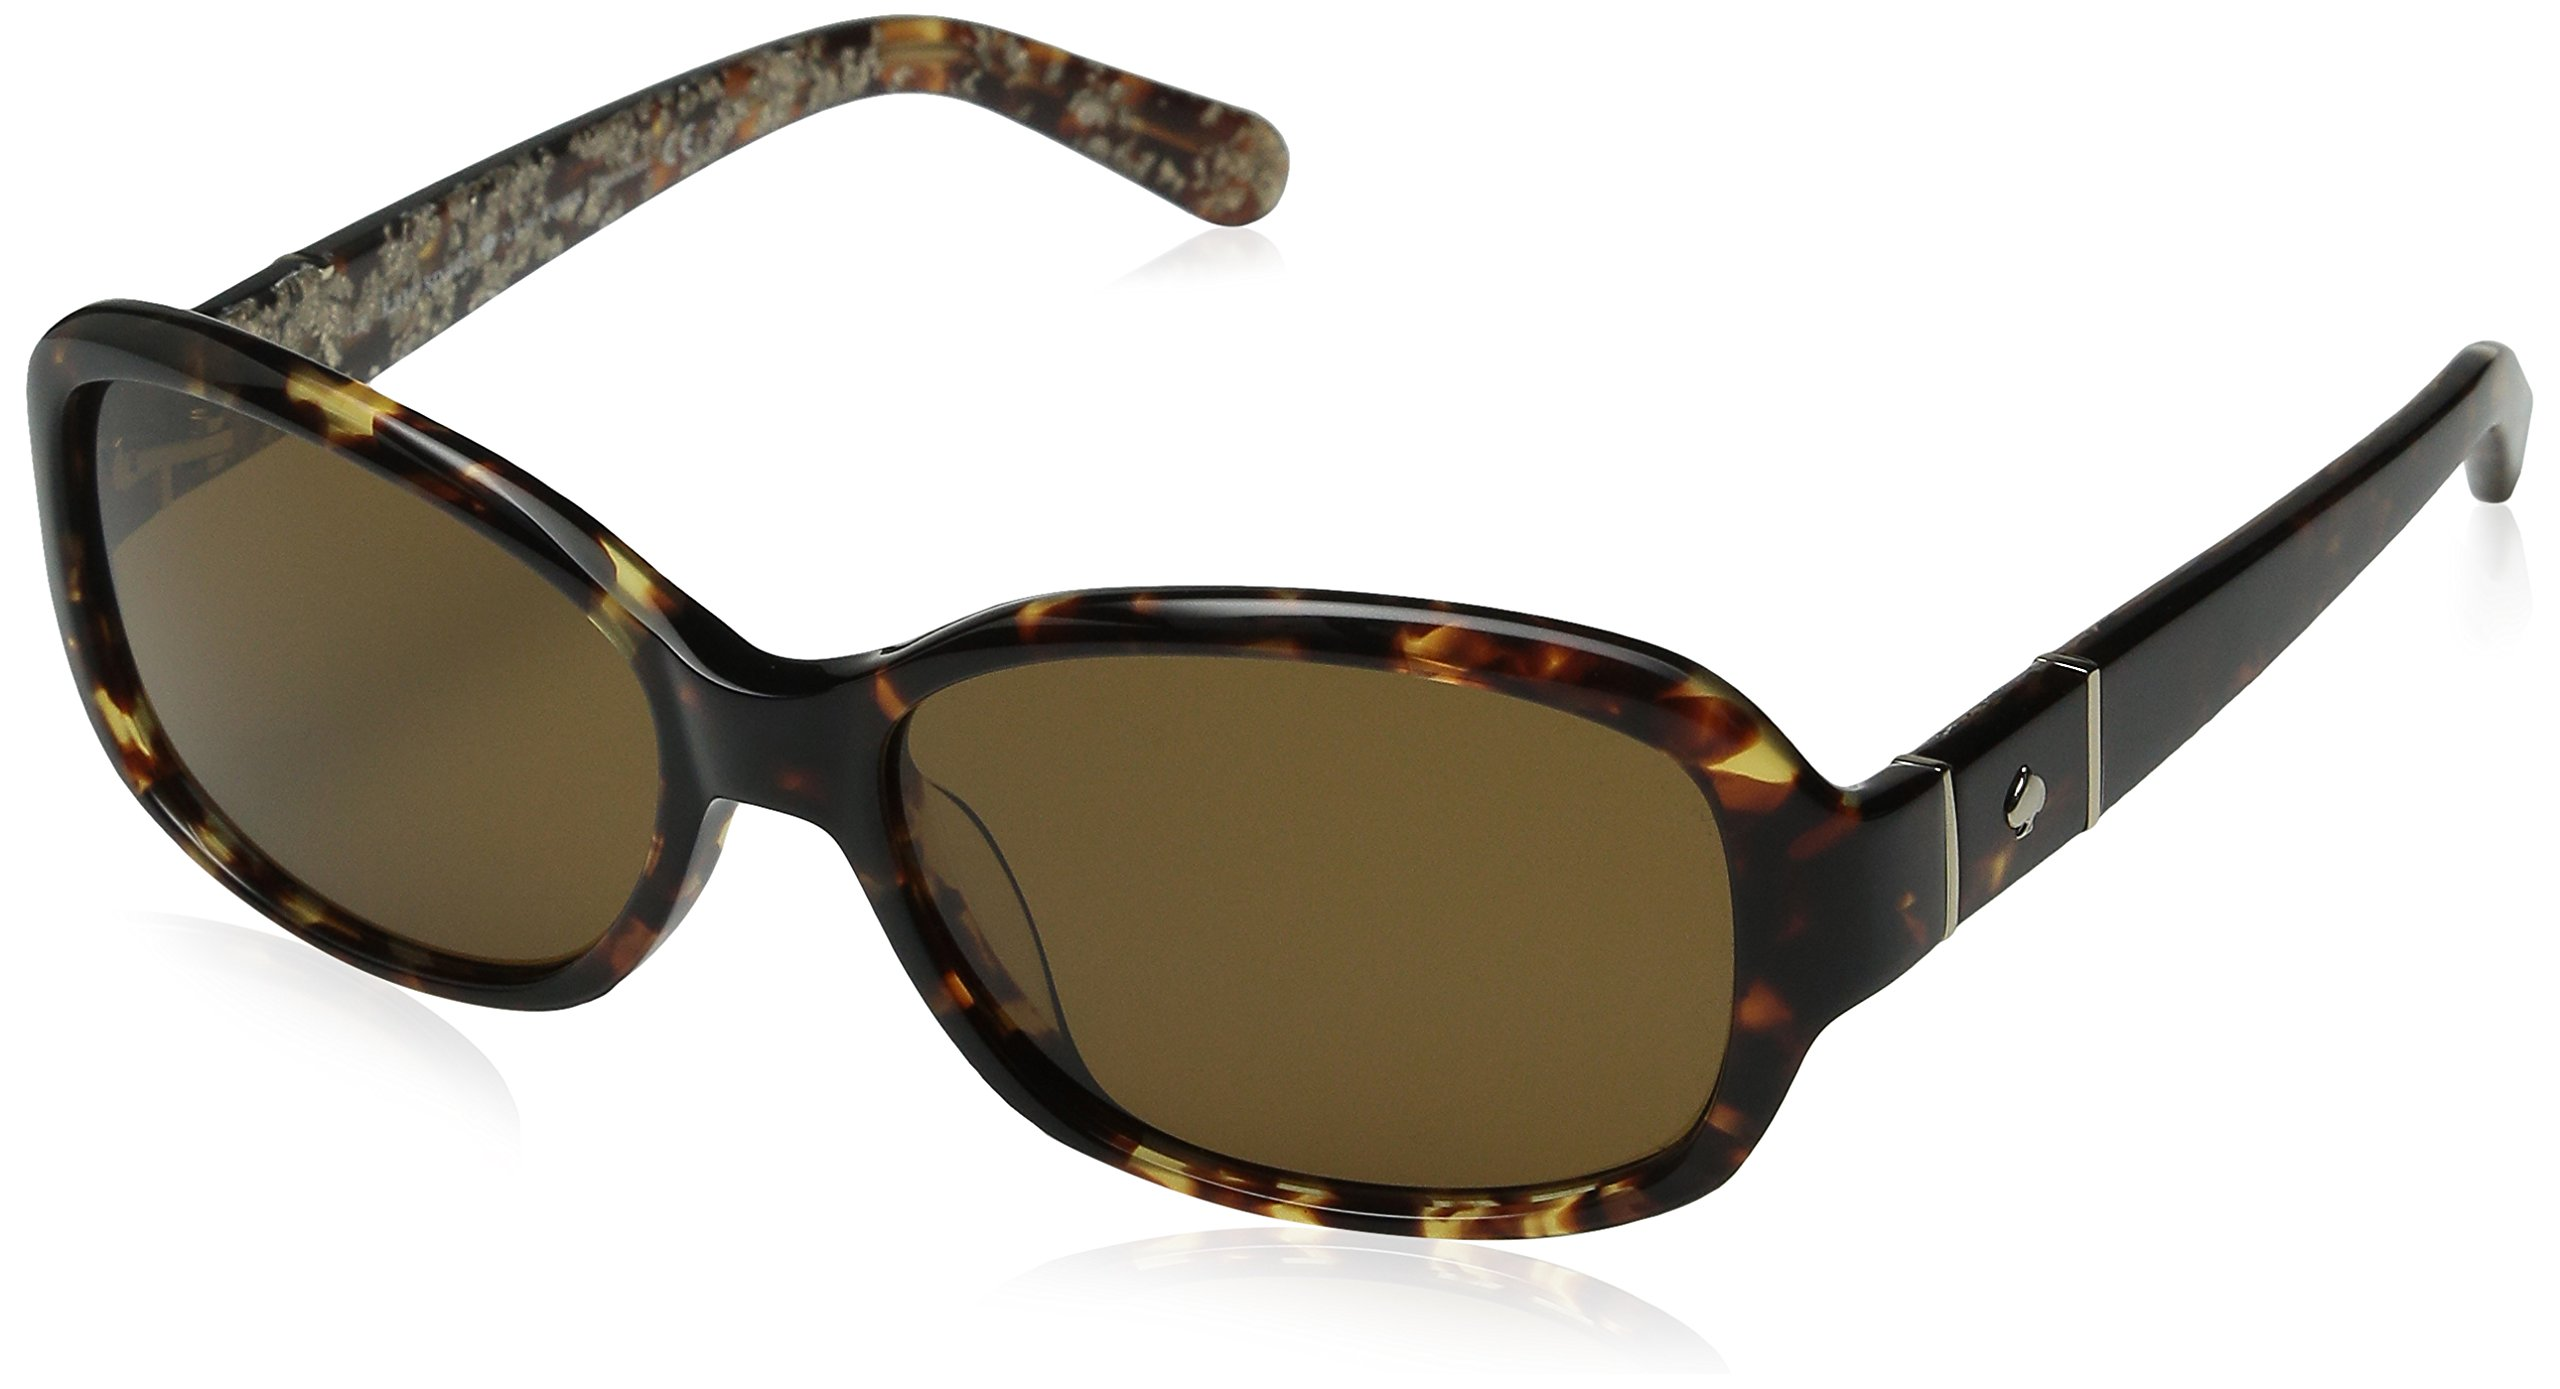 Kate Spade Women's Cheyenne/P/S Polarized Rectangular Sunglasses